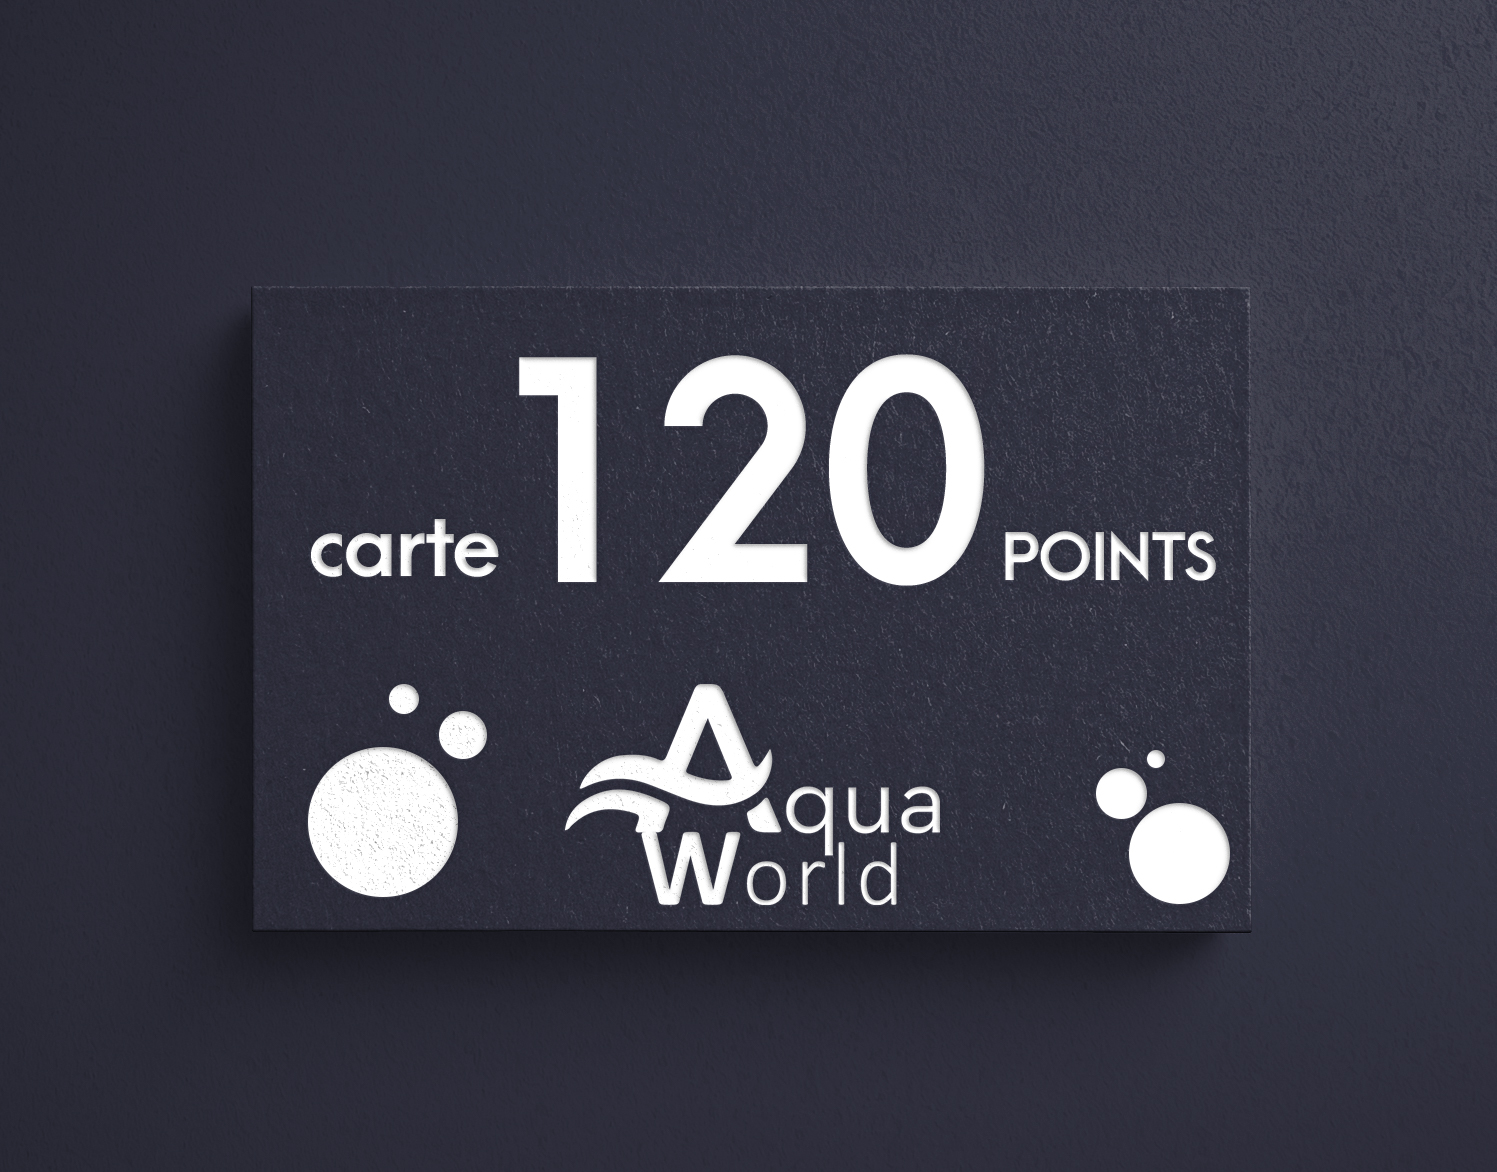 carte 120 points aquaworld